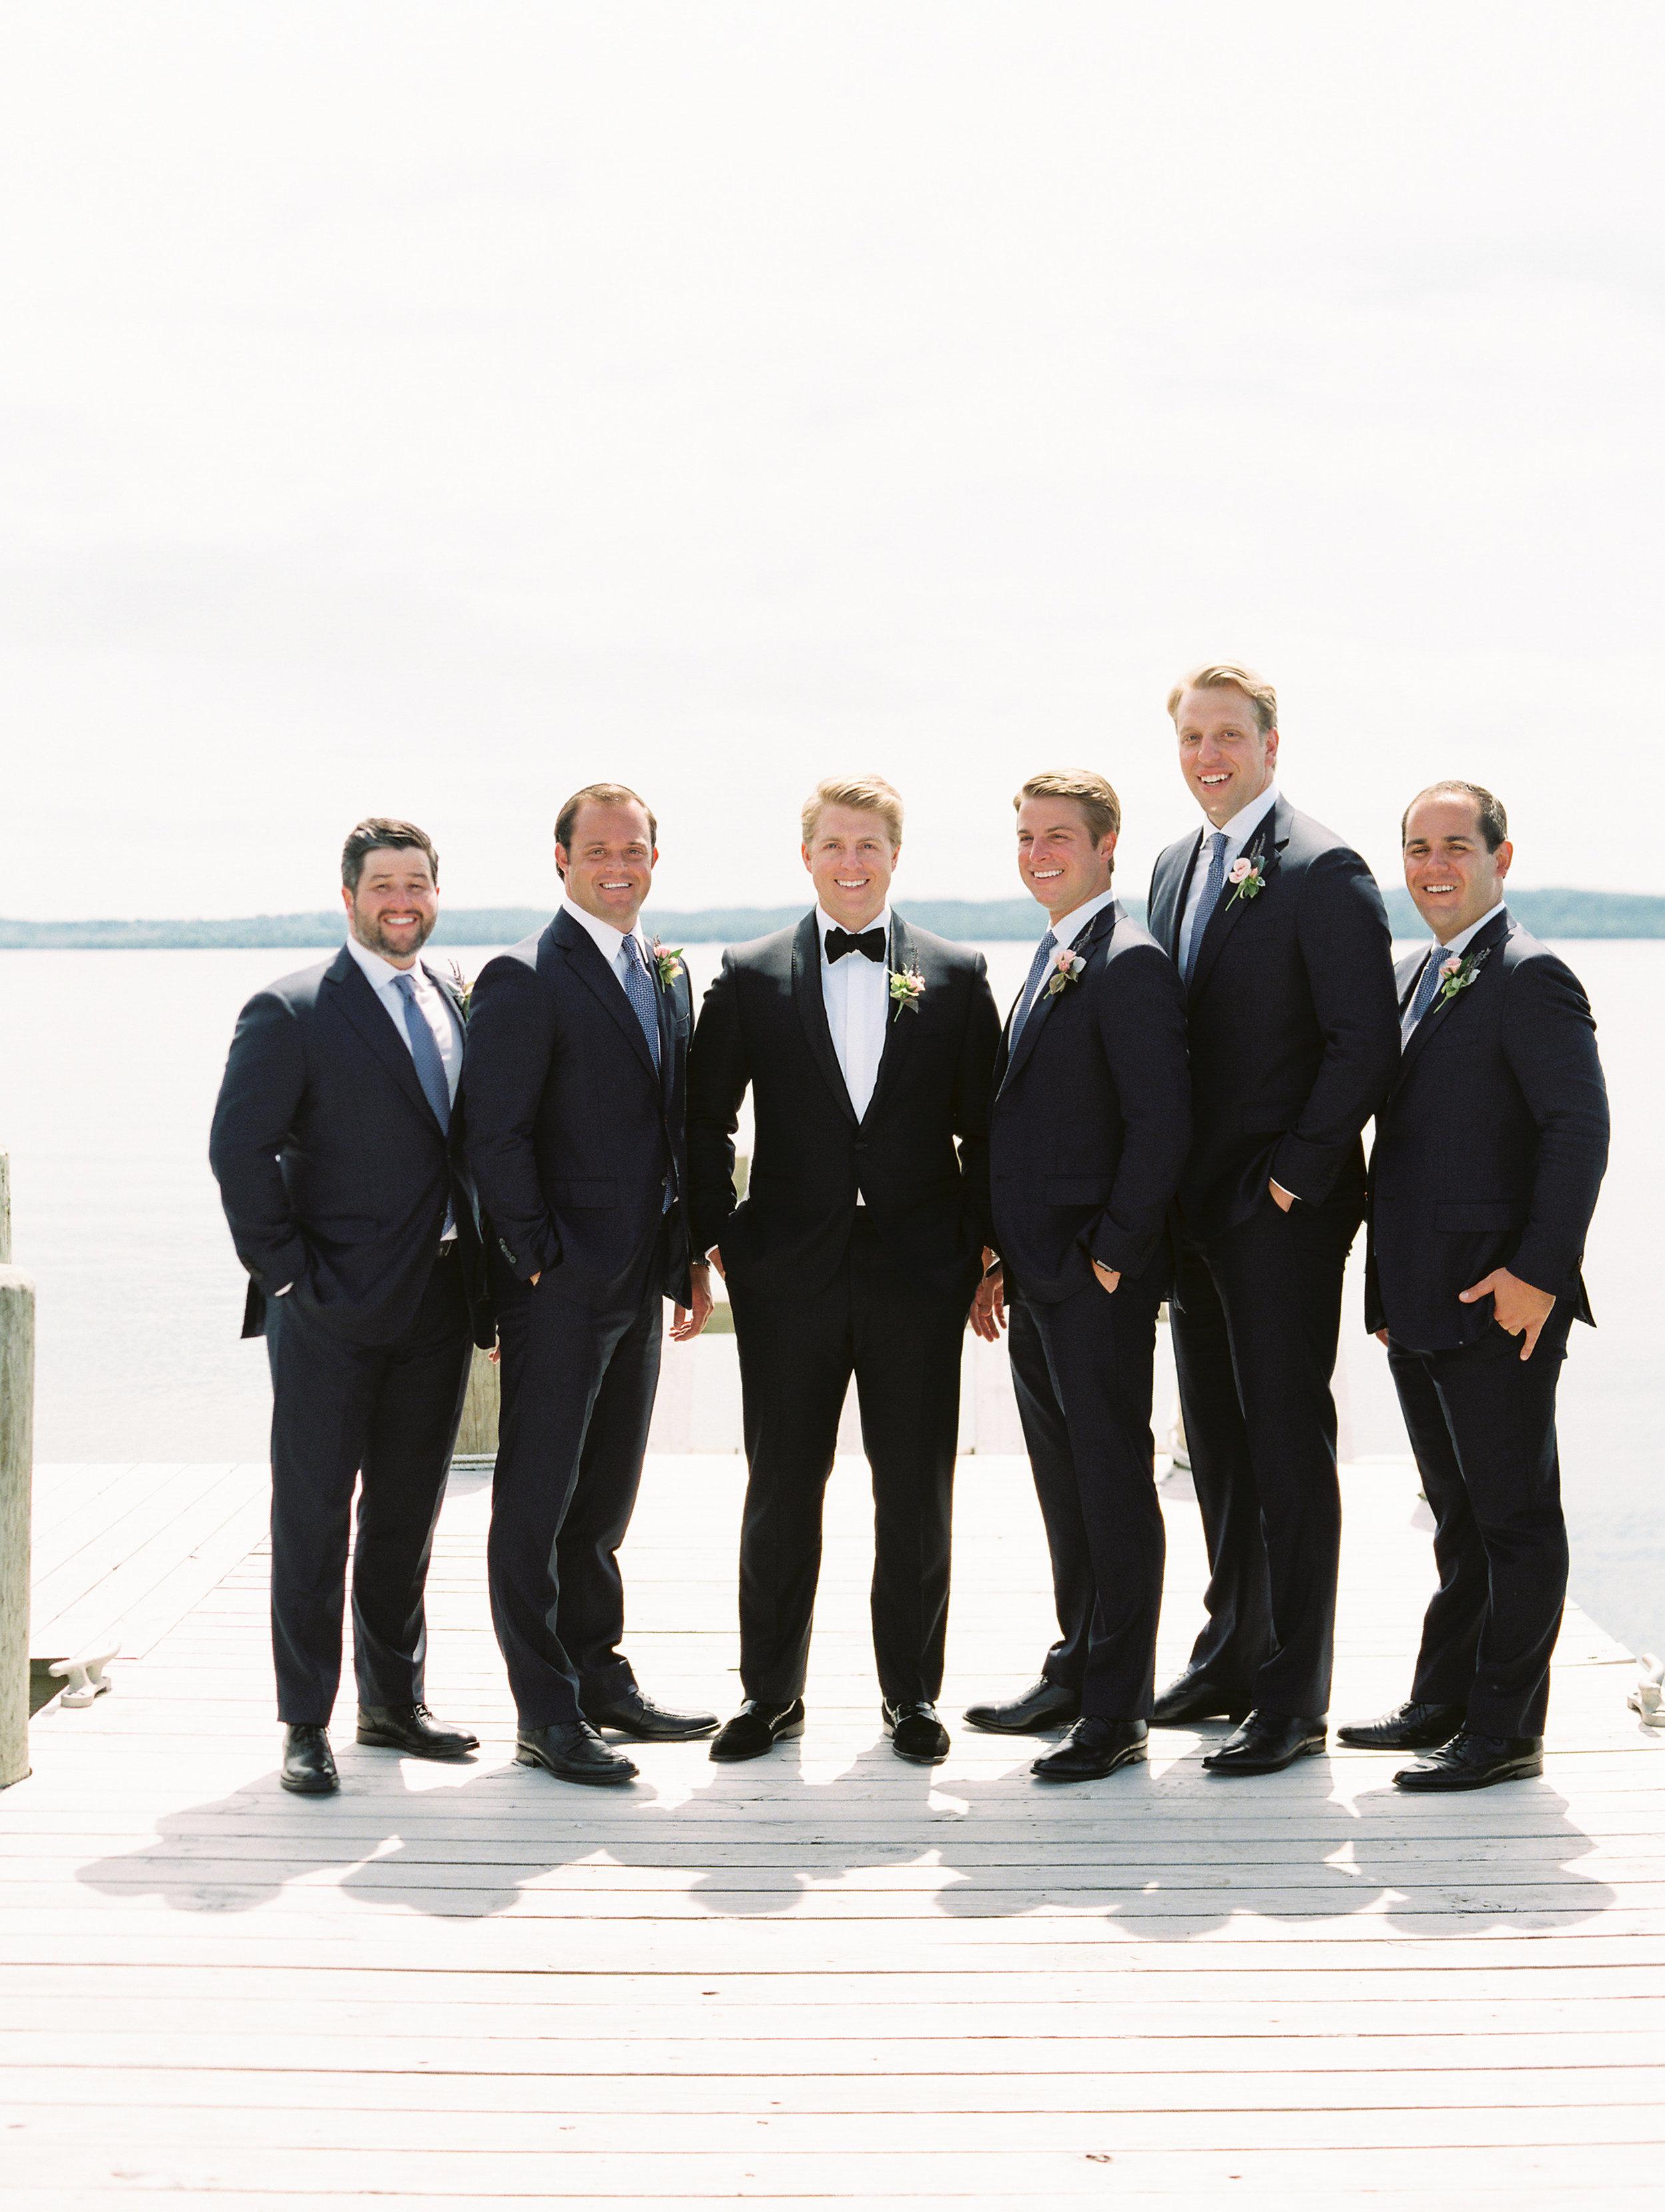 Coffman+Wedding+Bridal+Party-6.jpg